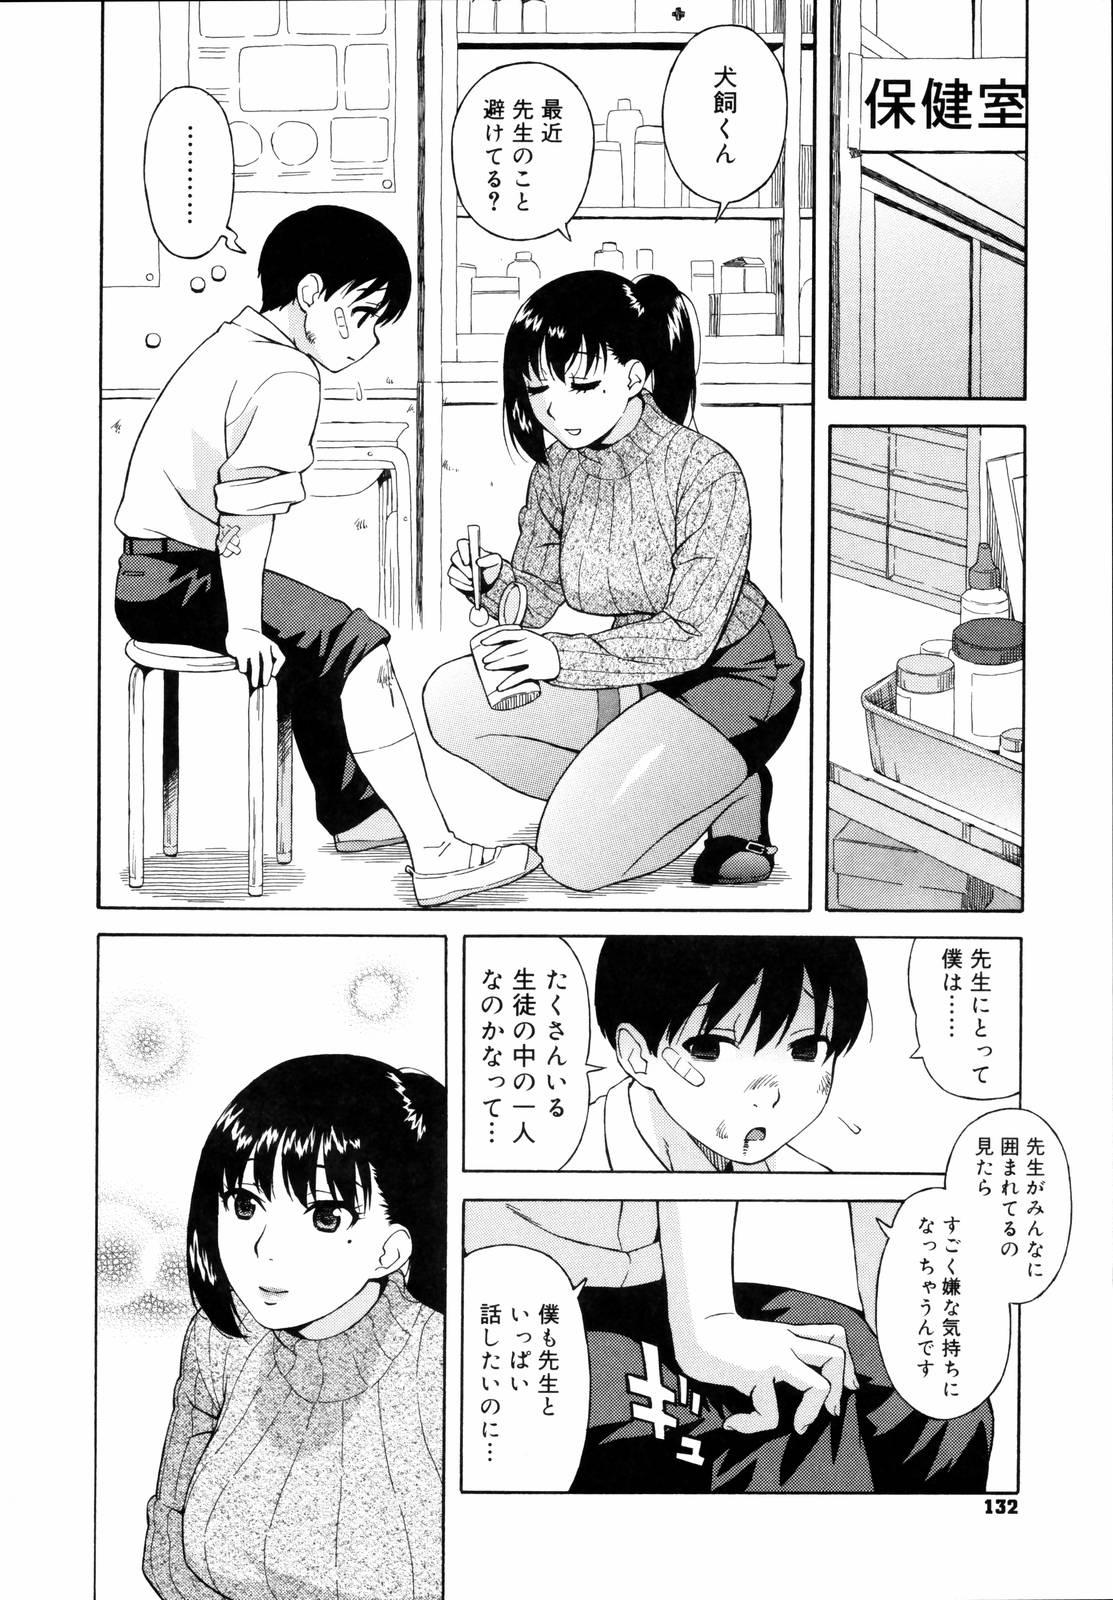 Shishunki wa Hatsujouki - Adolescence is a sexual excitement period. 133